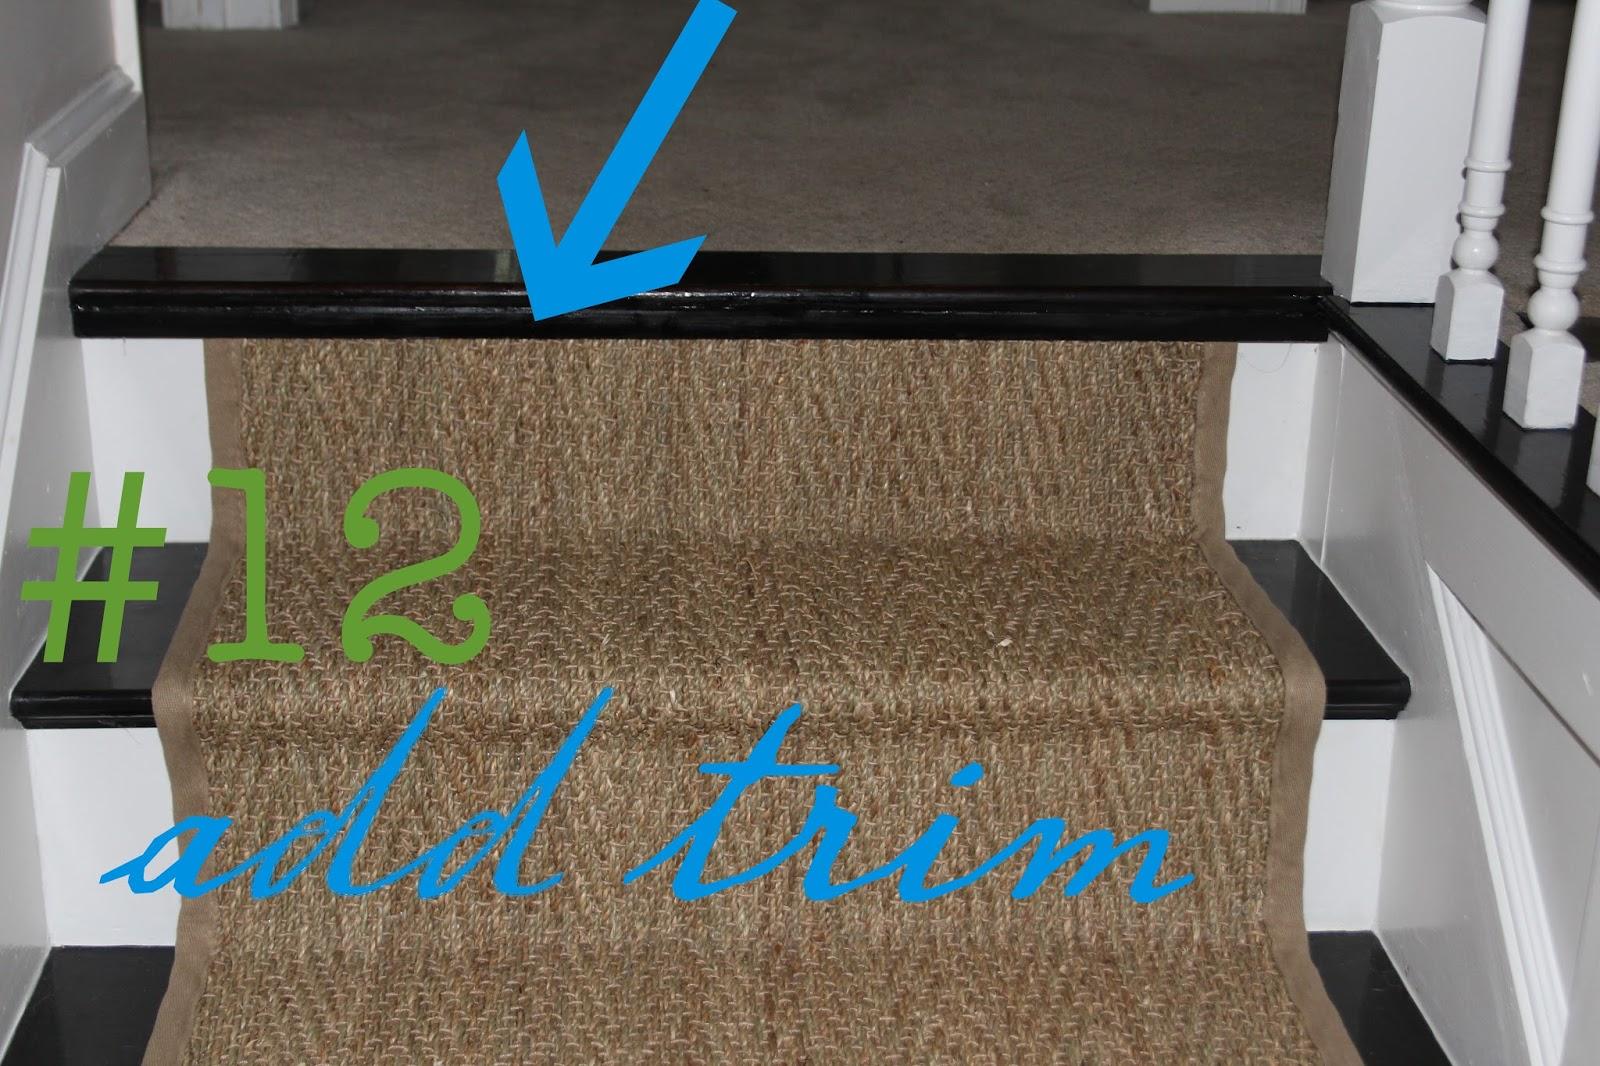 Gloria Stair Rug Skid Resistant Indoor Outdoor Beautifully | Gloria Rug Stair Treads | Mats | Area Rug | Stair Runners | Rubber Backing | Skid Resistant